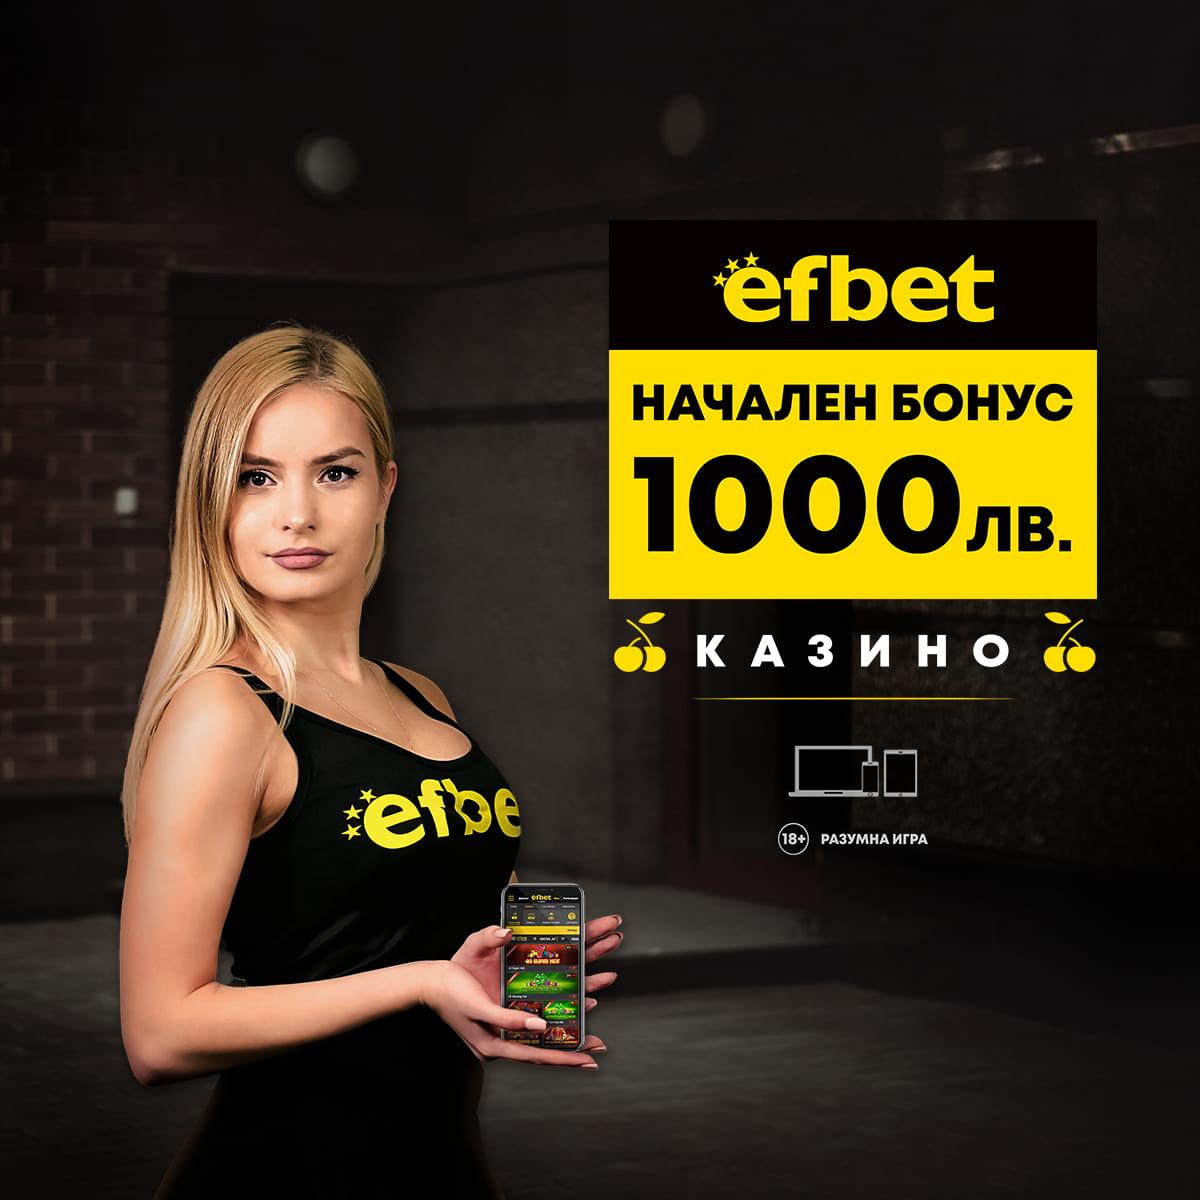 1000лв бонус казино ефбет